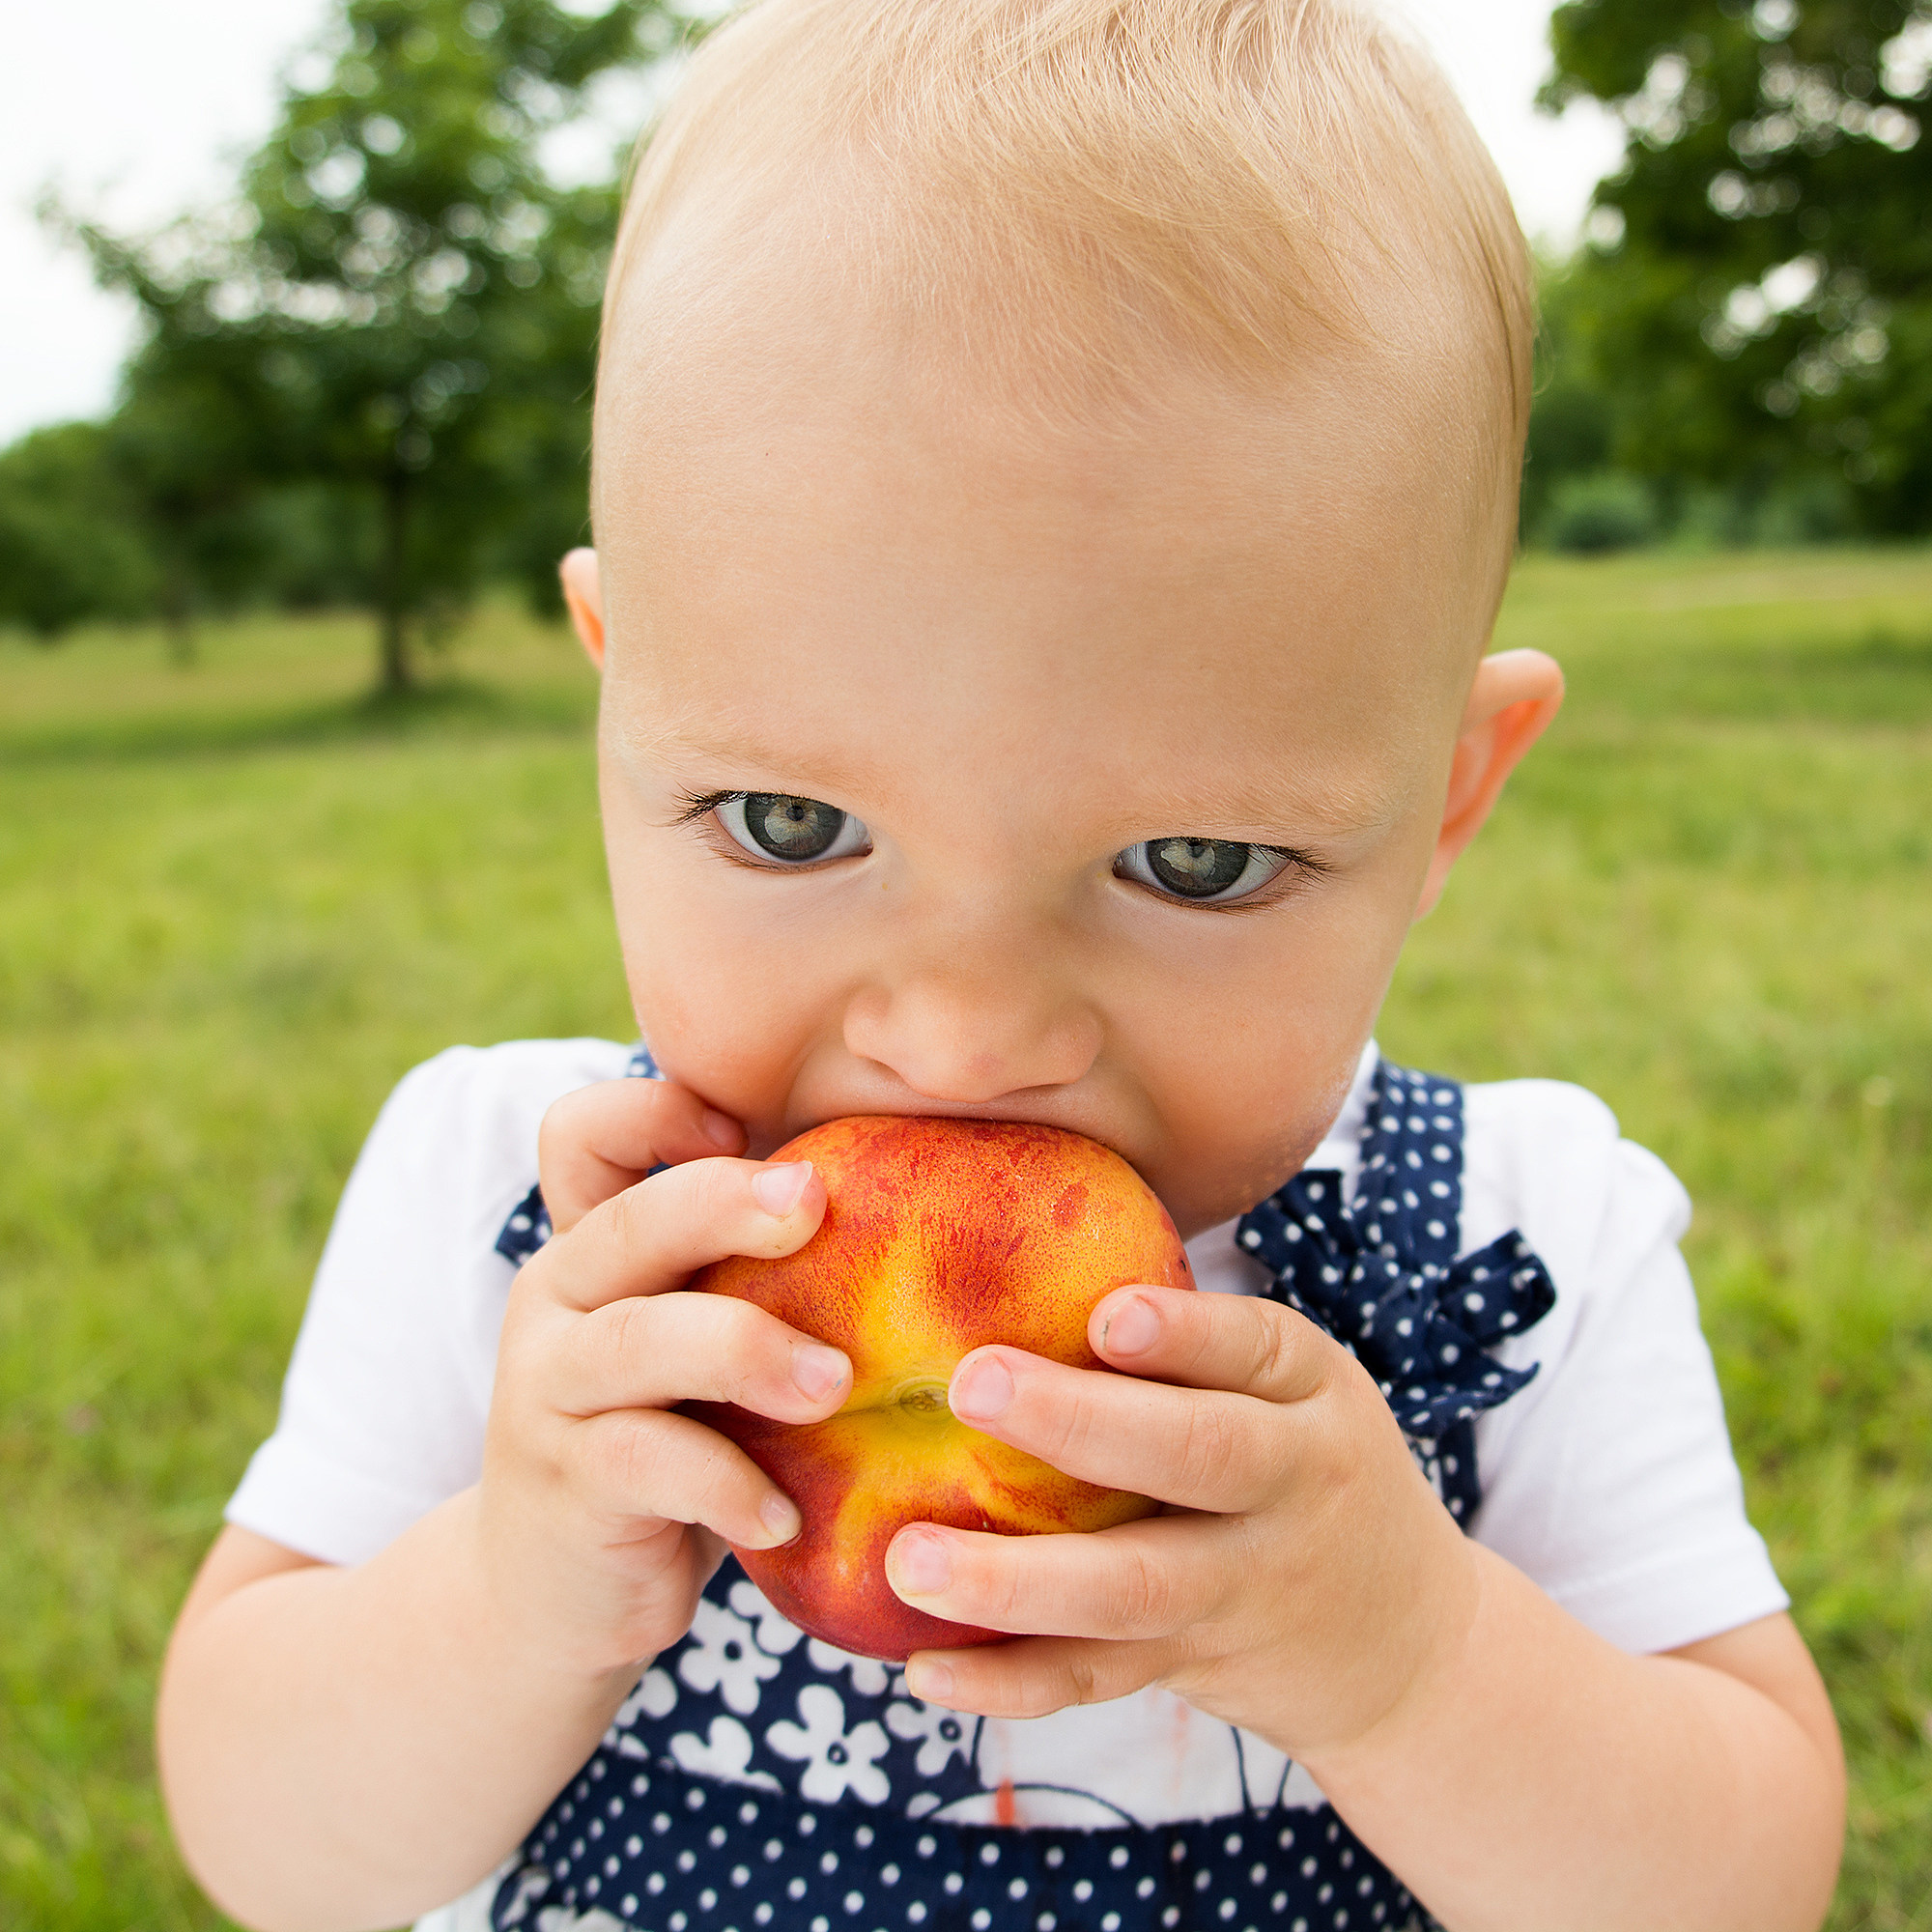 cute little girl eating peach on the grass in summertime